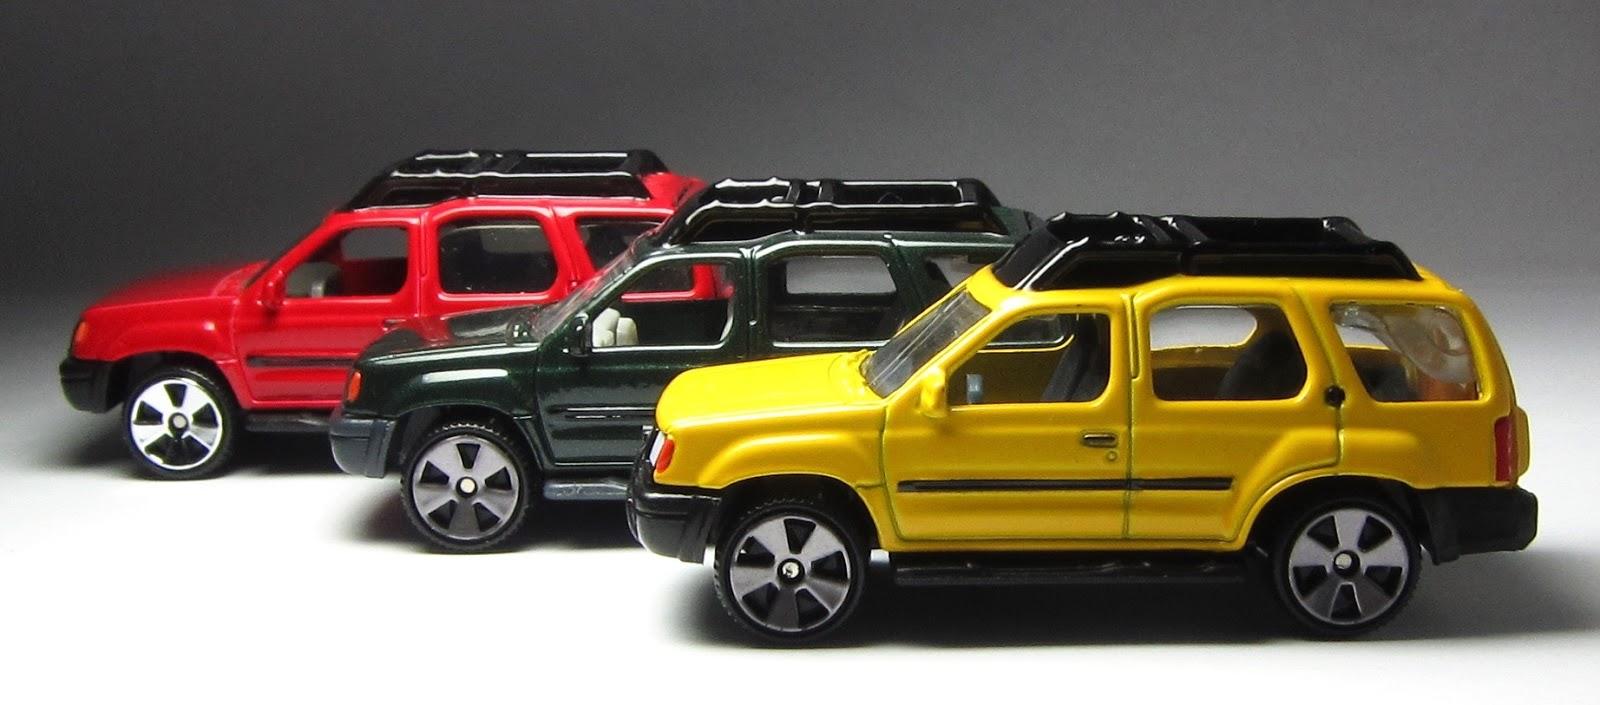 The Last Golden Age Of Matchbox 2005 2006 Superfast Nissan Xterra